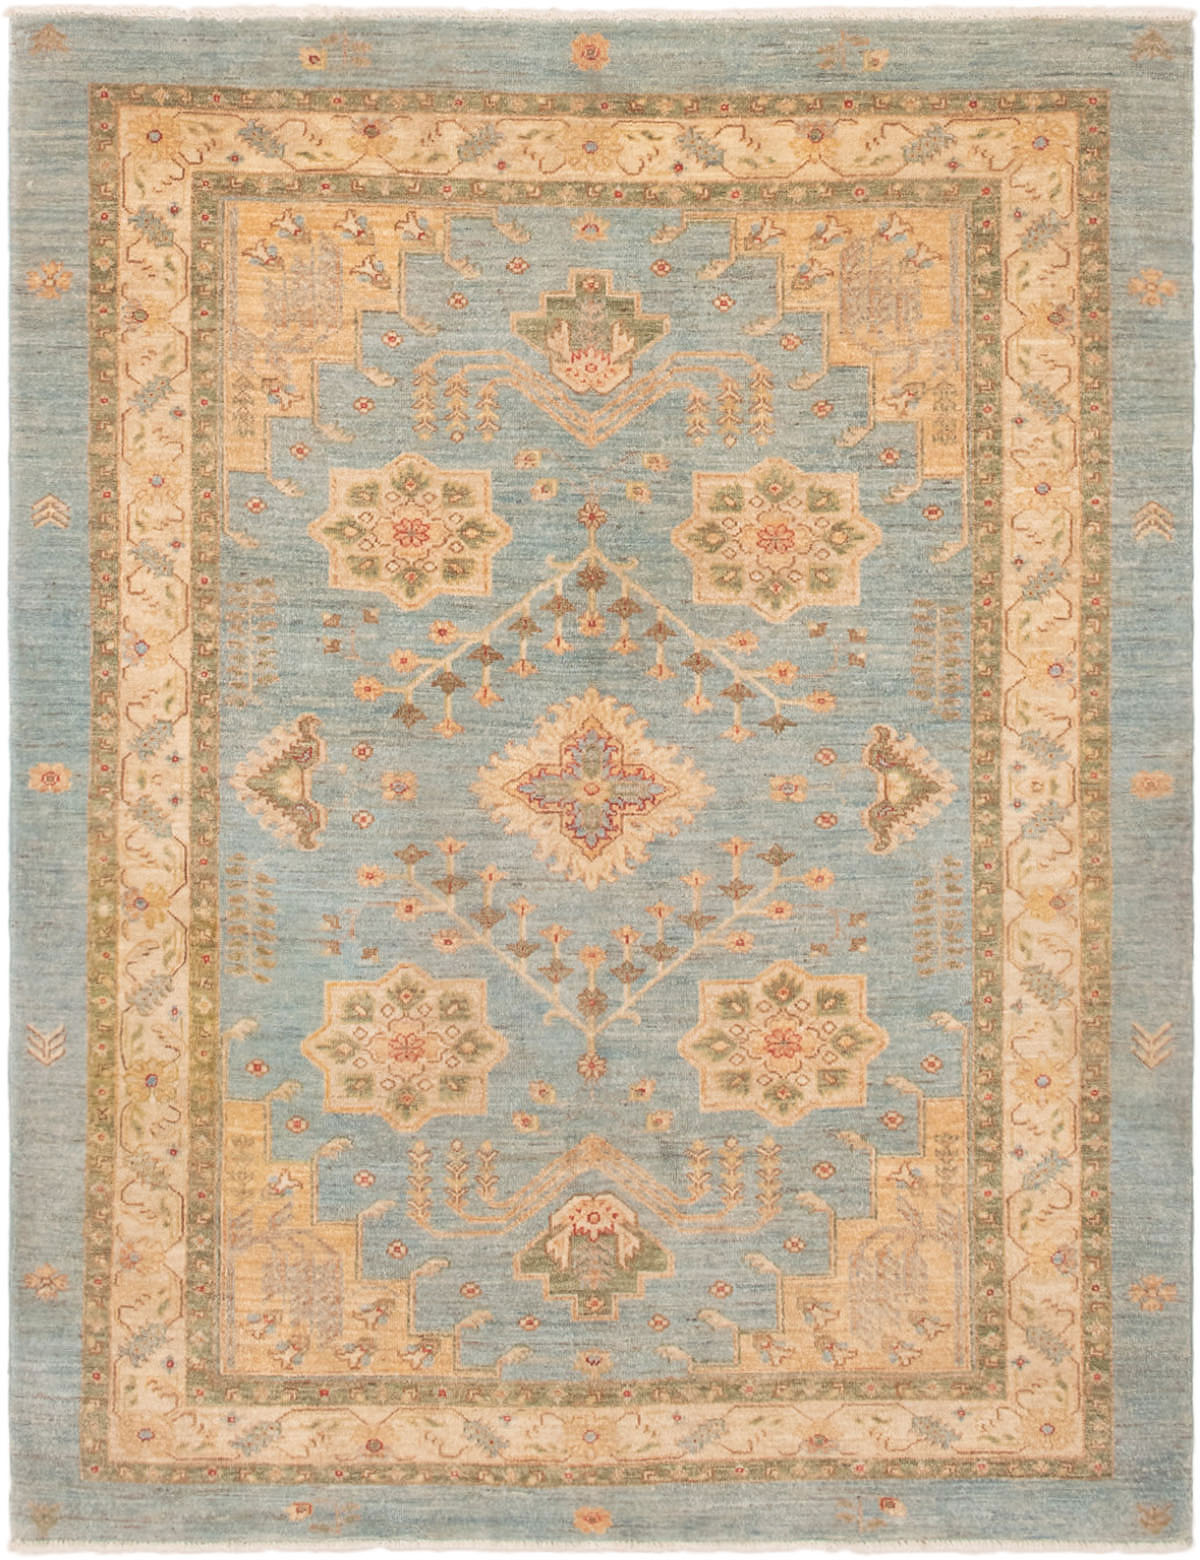 "Hand-knotted Peshawar Oushak Sky Blue Wool Rug 5'0"" x 6'5"" Size: 5'0"" x 6'5"""